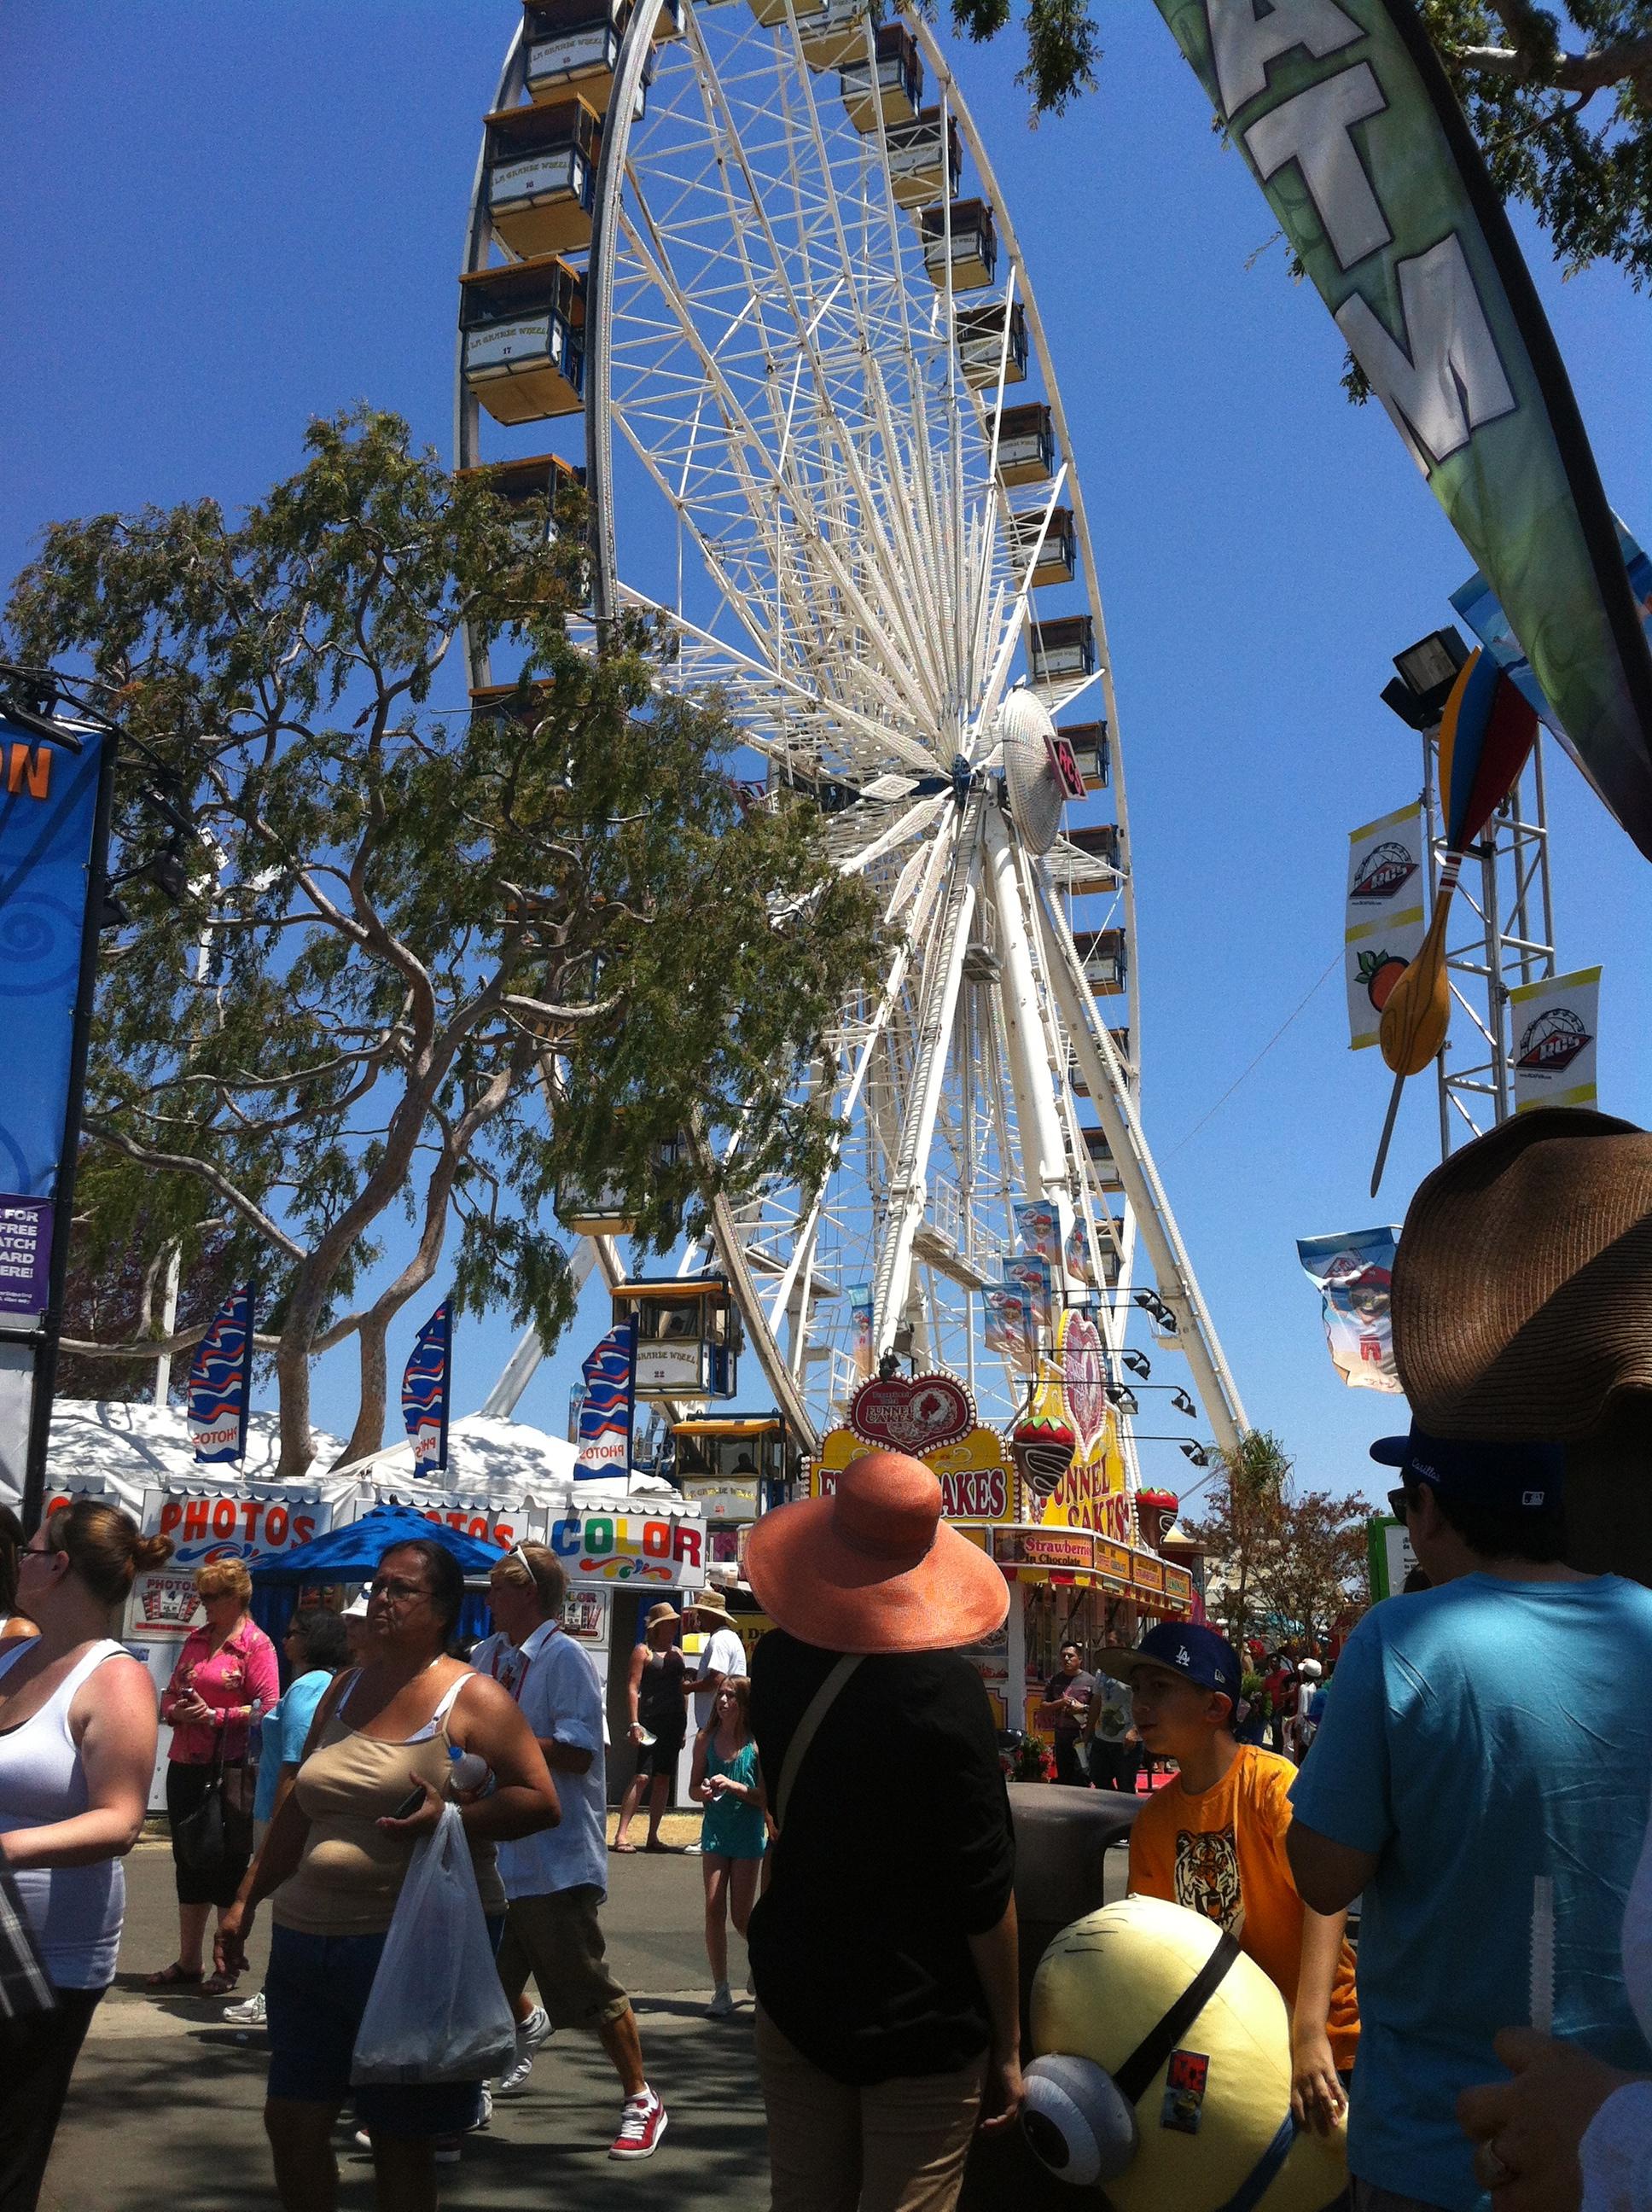 THE OC Fair - Orange County - Costa Mesa